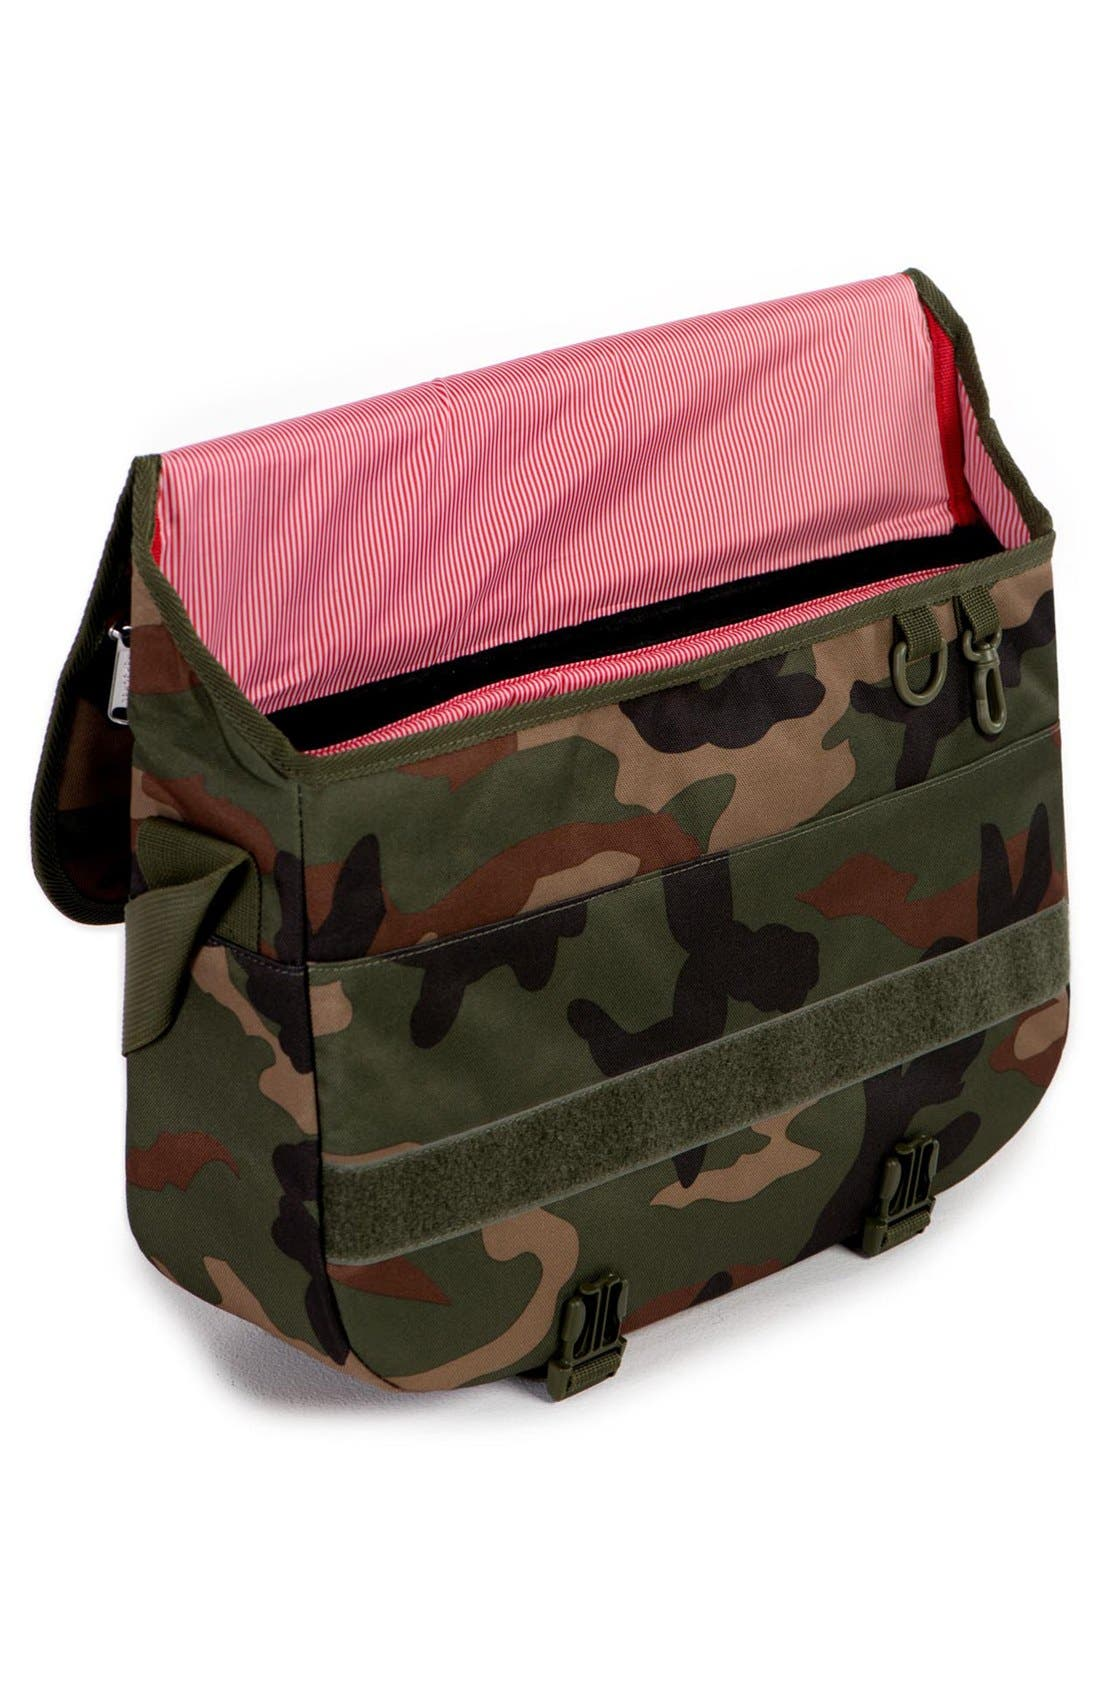 'Pop Quiz' Messenger Bag,                             Alternate thumbnail 3, color,                             Woodland Camo